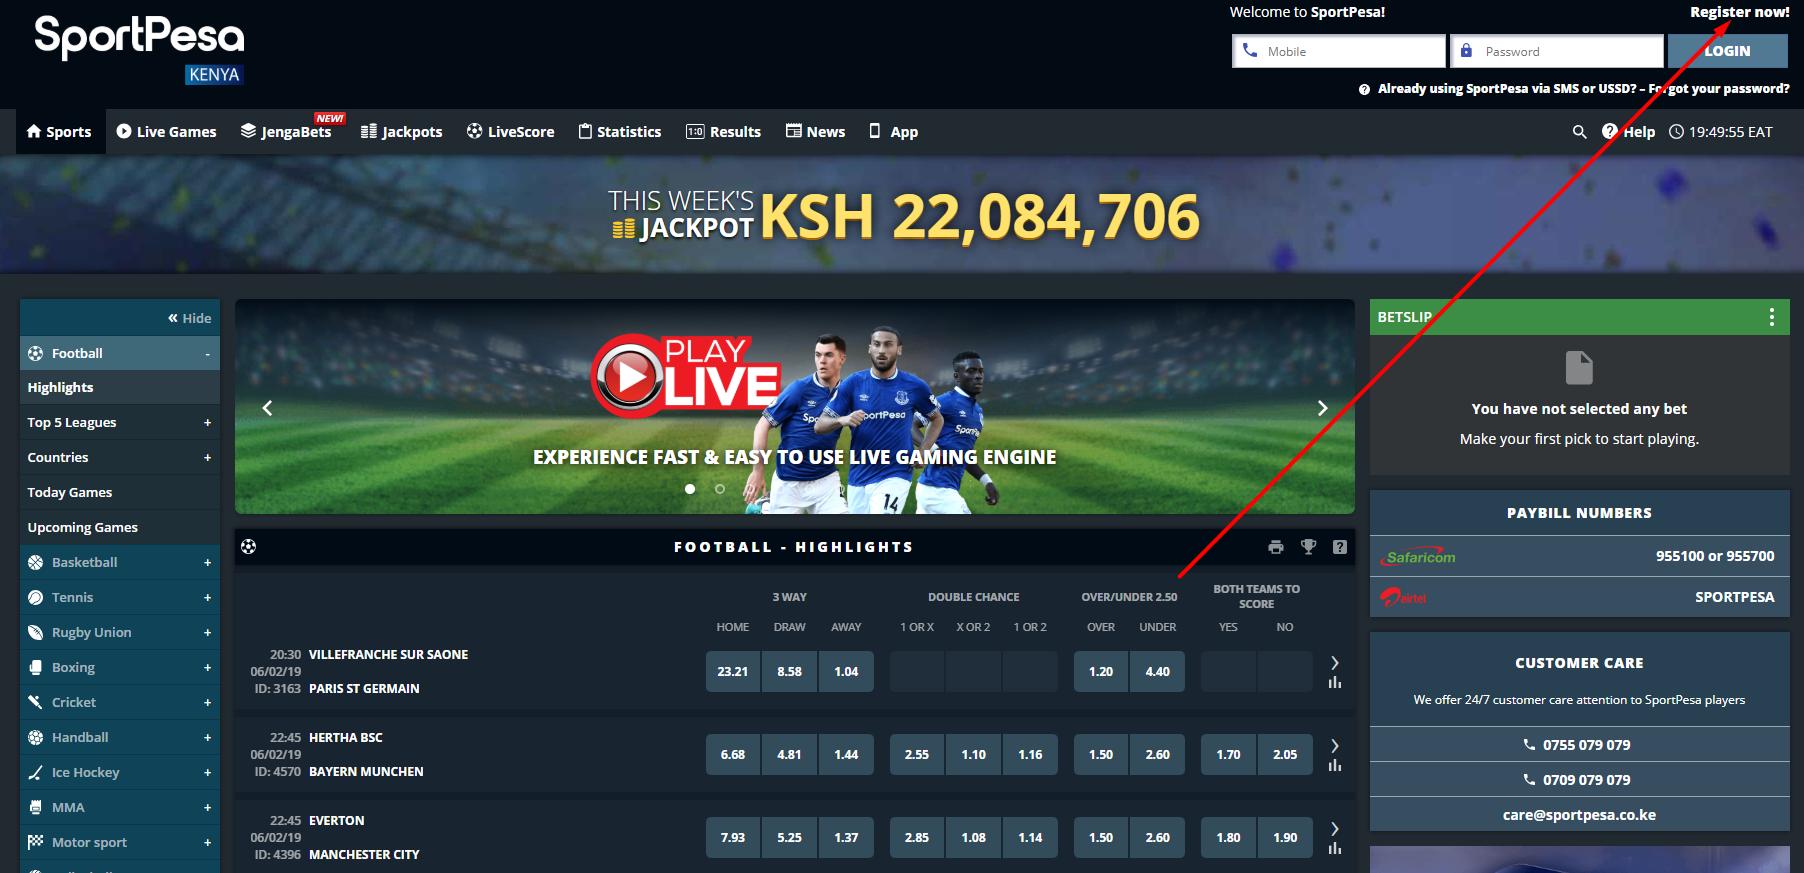 Sportpesa Kenya registration